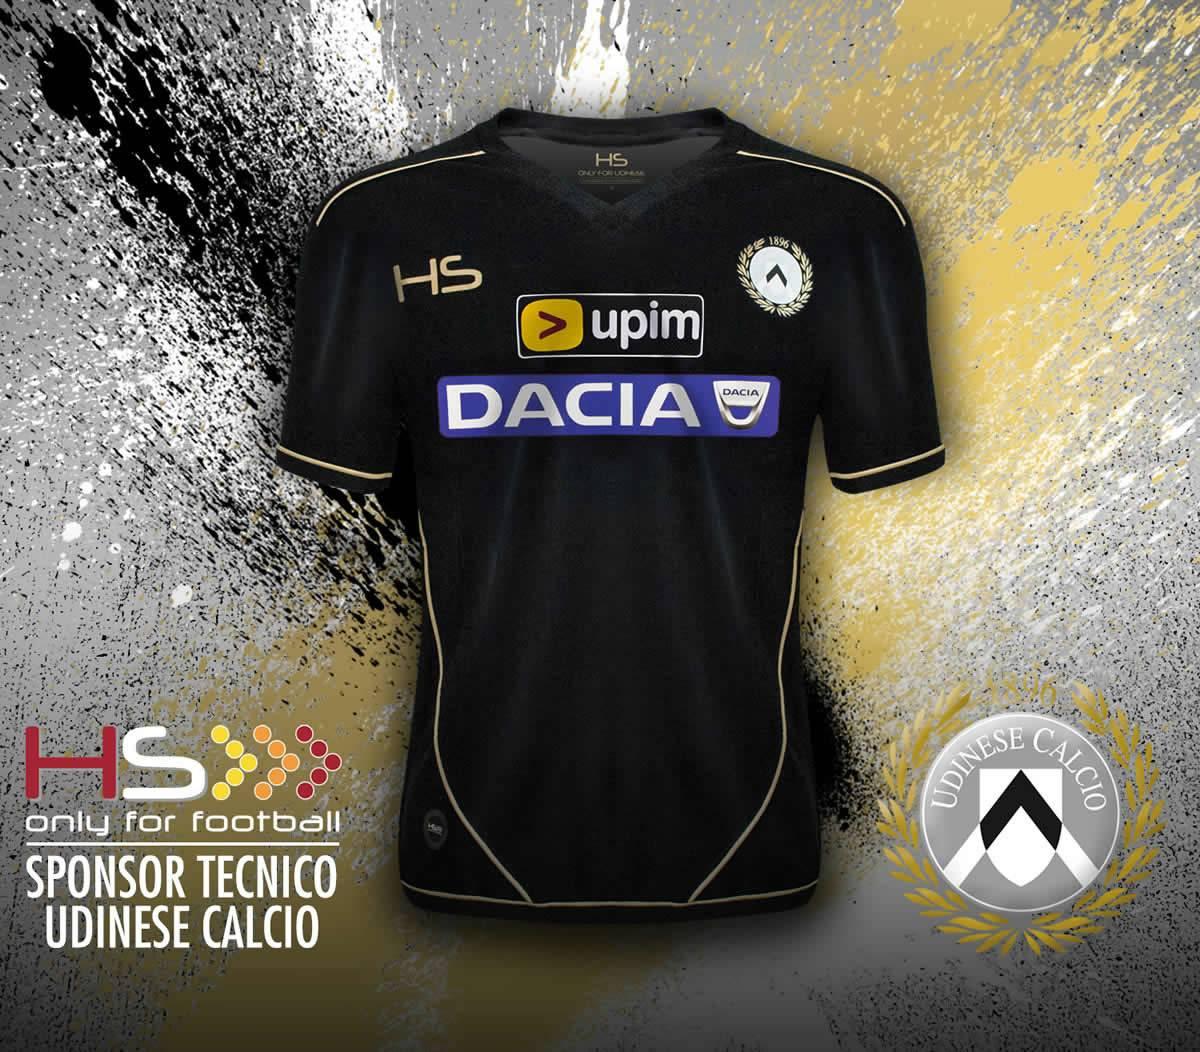 Tercera camiseta de Udinese para 2014/15 | Imagen HS Football